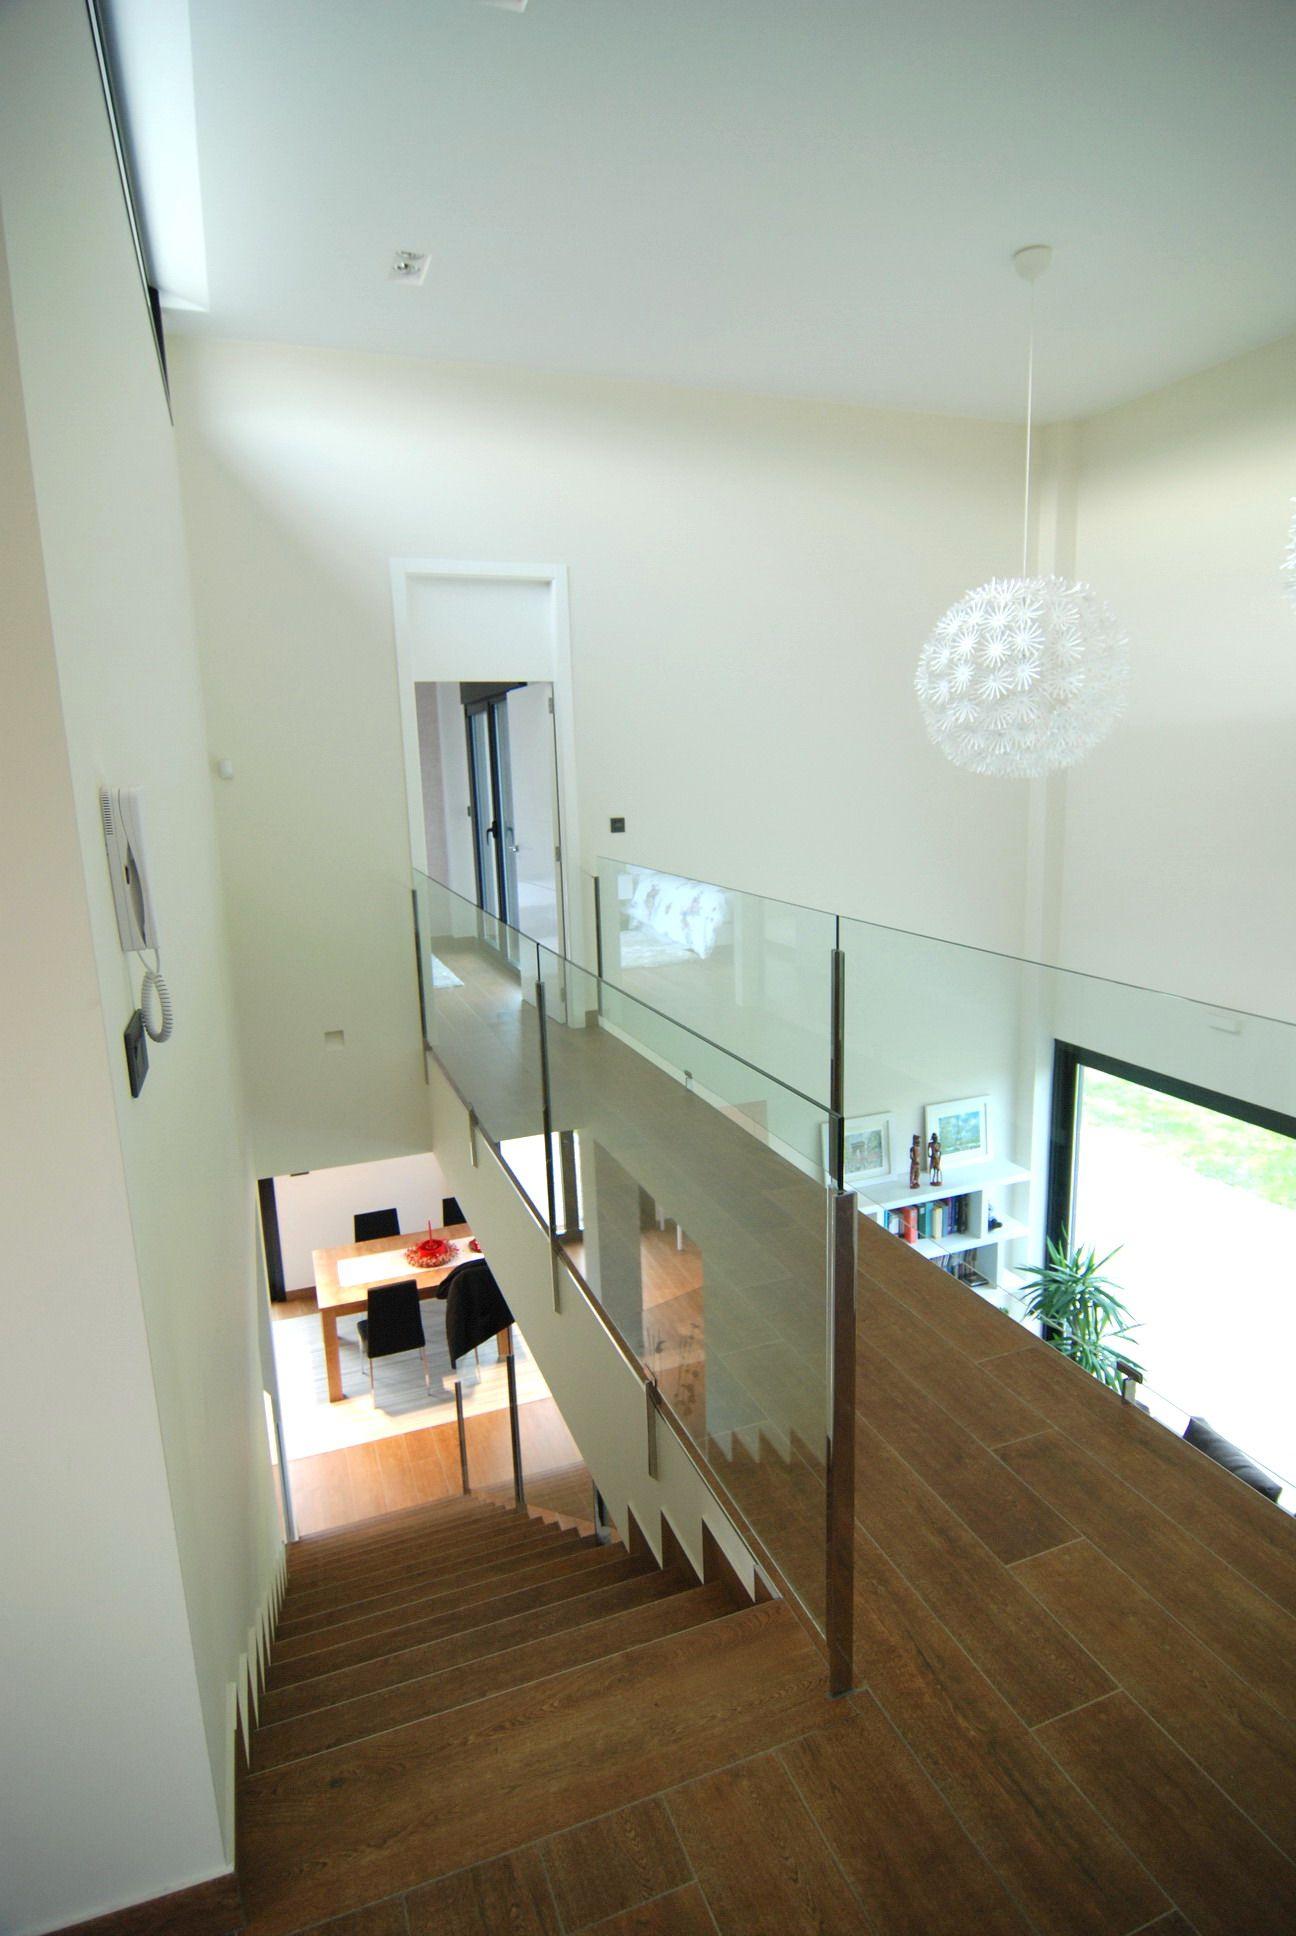 Escalera desde arriba con espacio a doble altura del - Salon doble altura ...